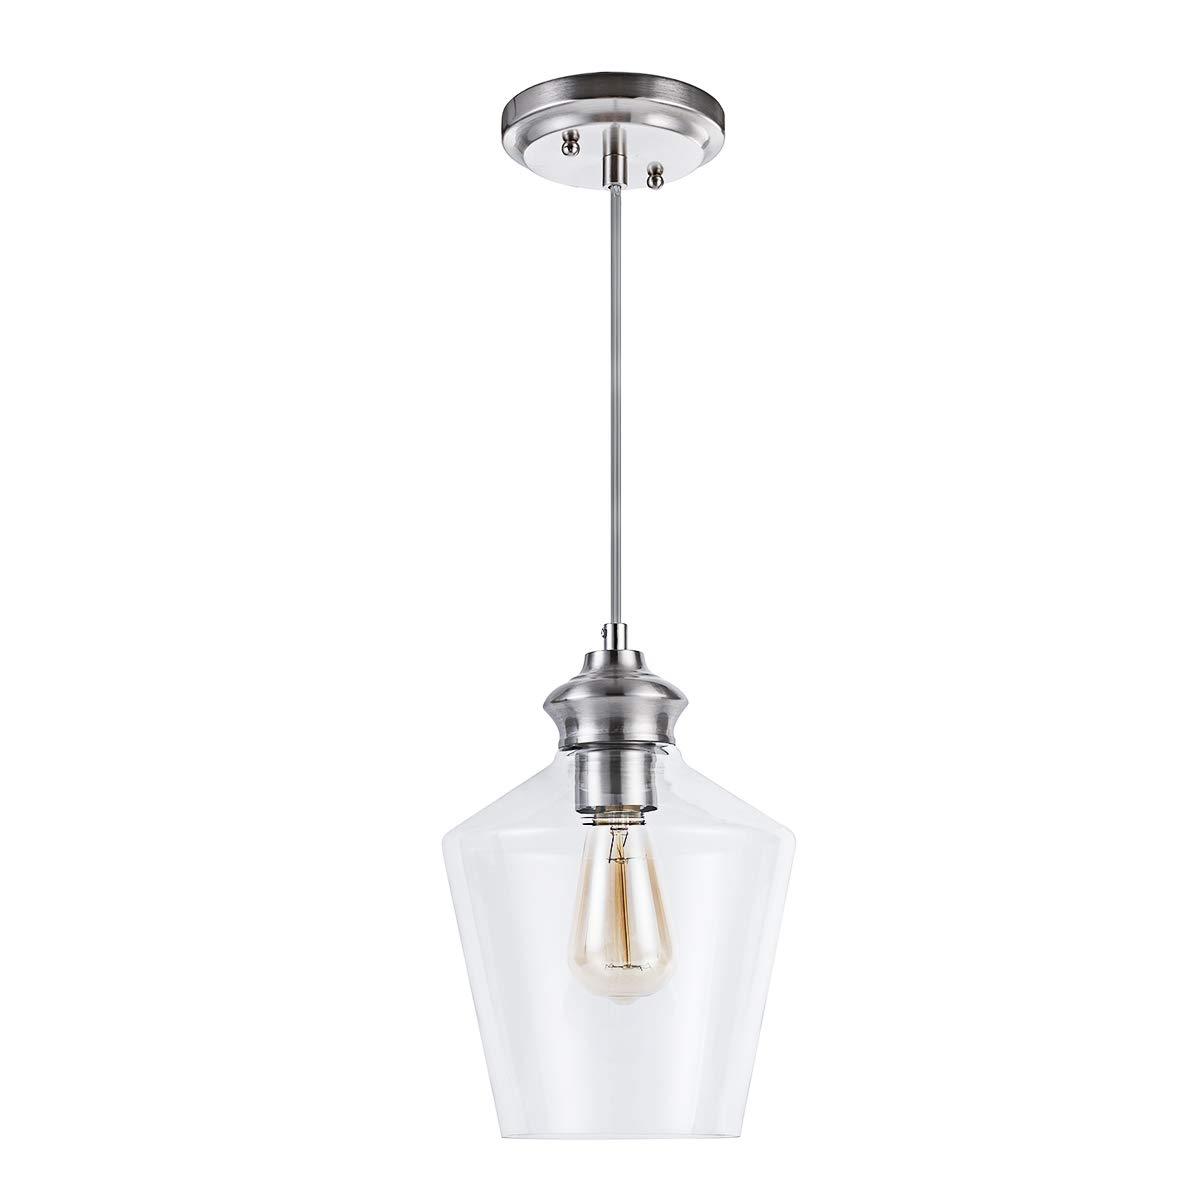 Lanros Mini Pendant Lights, Hand Blown Clear Glass Drop Ceiling Pendant Lighting for Kitchen, Dining Room, Bar,Restaurants, Hotels, Satin Nickel